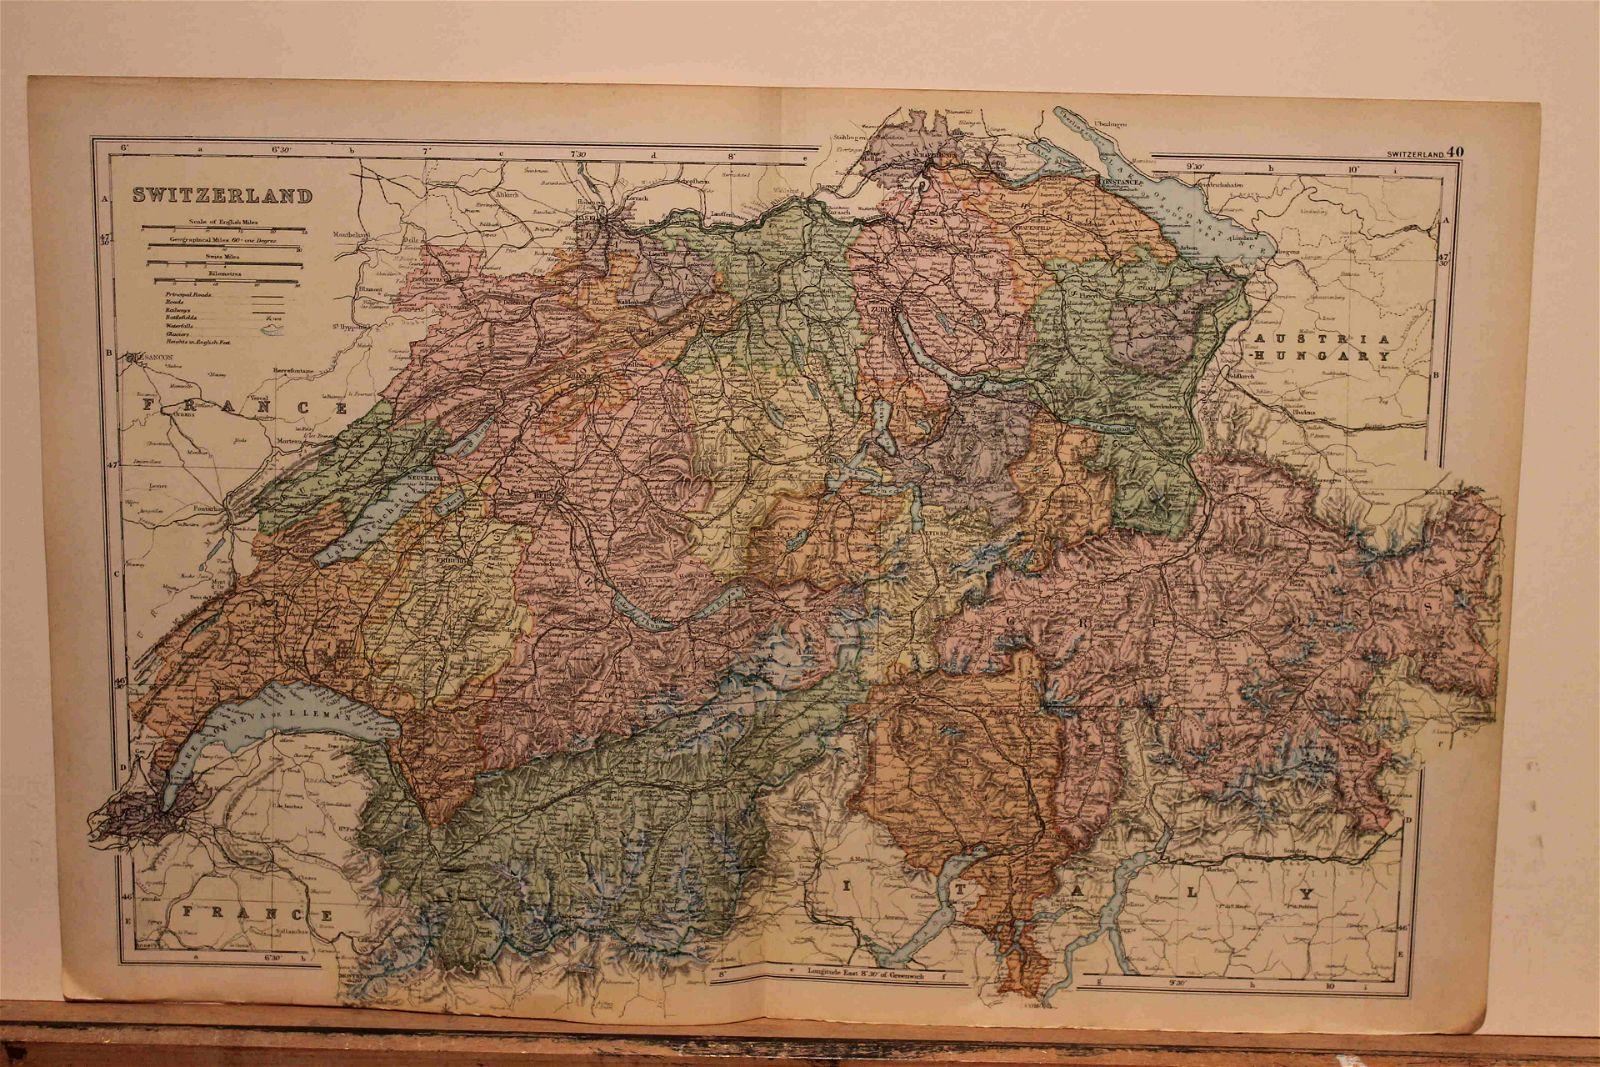 1882 Map of Switzerland